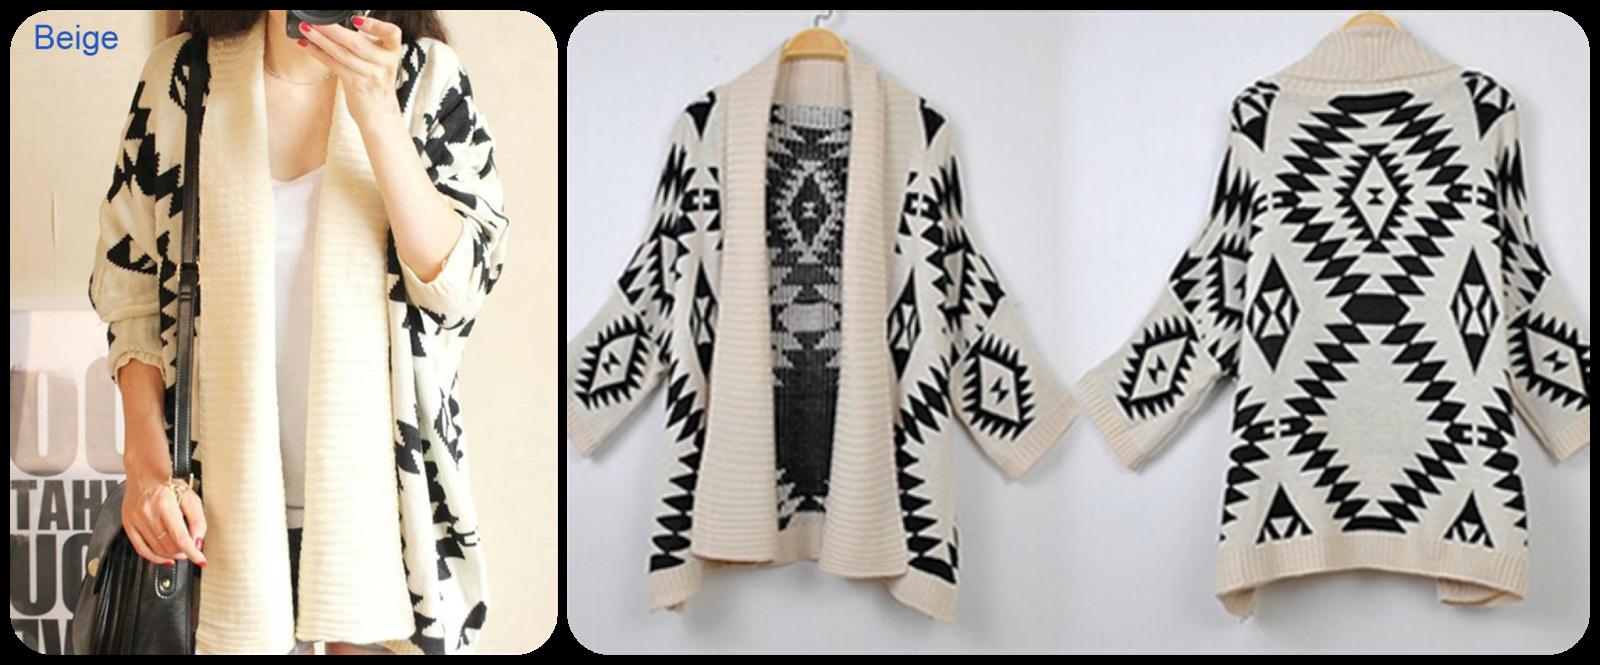 3c93822eaaf 11) Women's Geometric Pattern Open Front Loose Sweater Wrap Cape Cardigan  Πάμε τώρα σε μια ζακέτα, με υπέροχο σχέδιο την οποία θέλω πολύ να αποκτήσω!